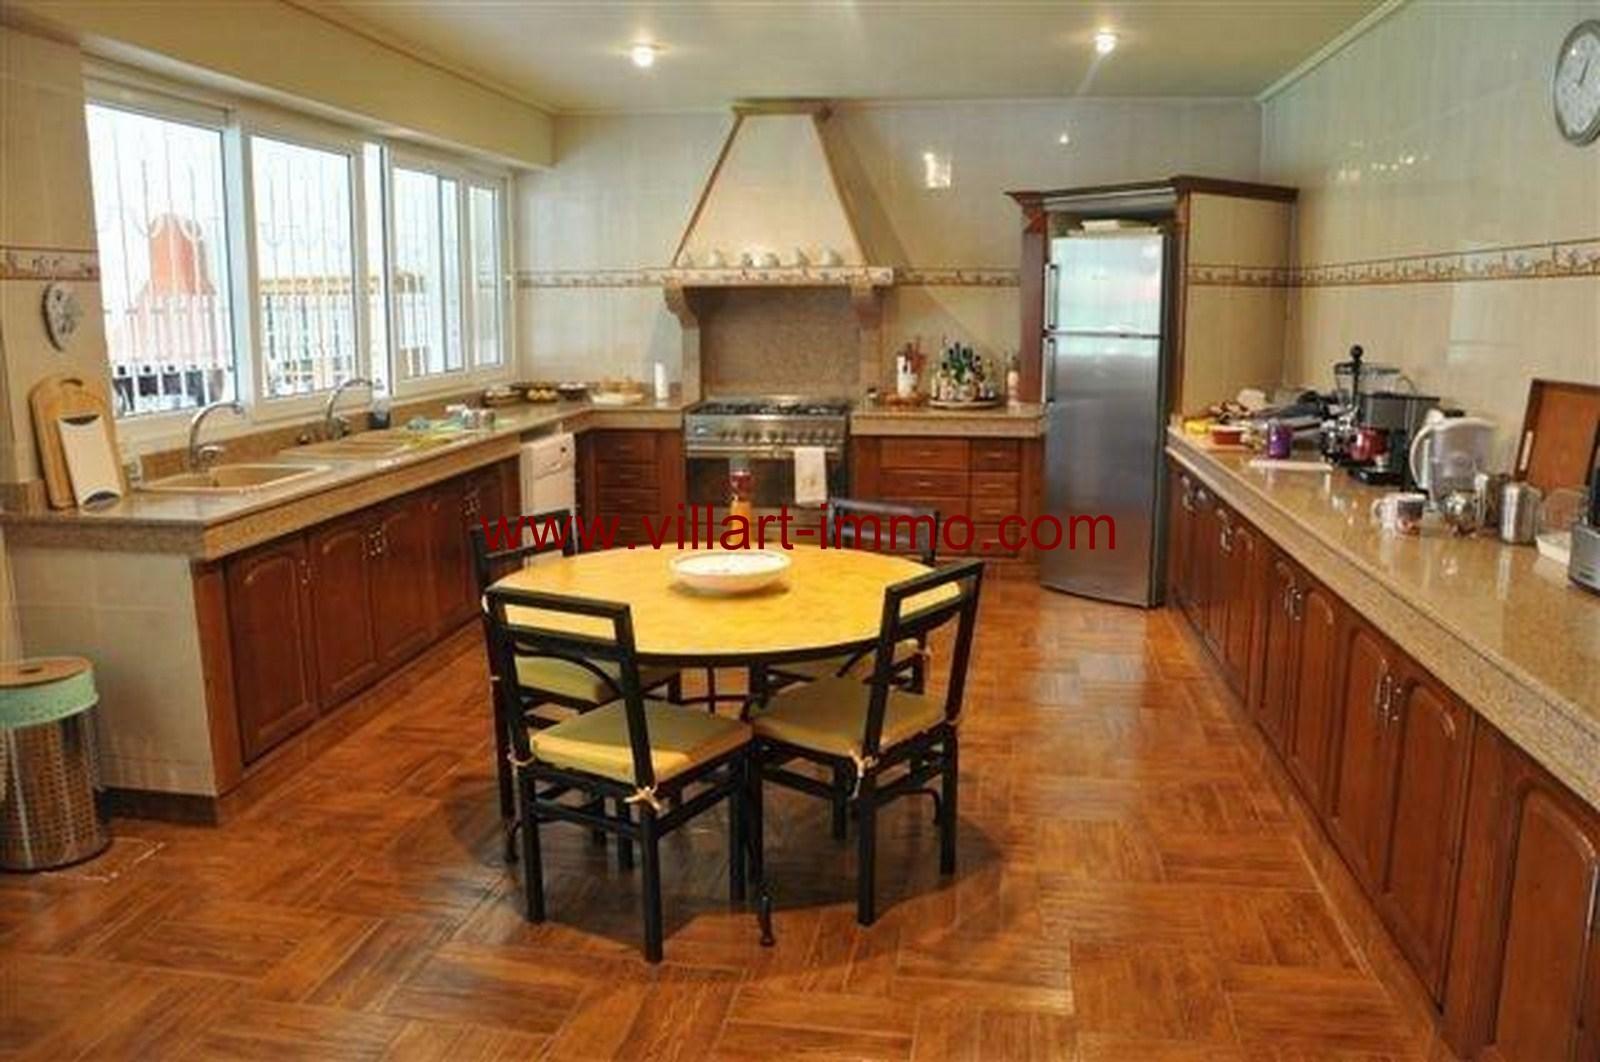 15-vente-villa-tanger-boubana-cuisine-vv363-villart-immo